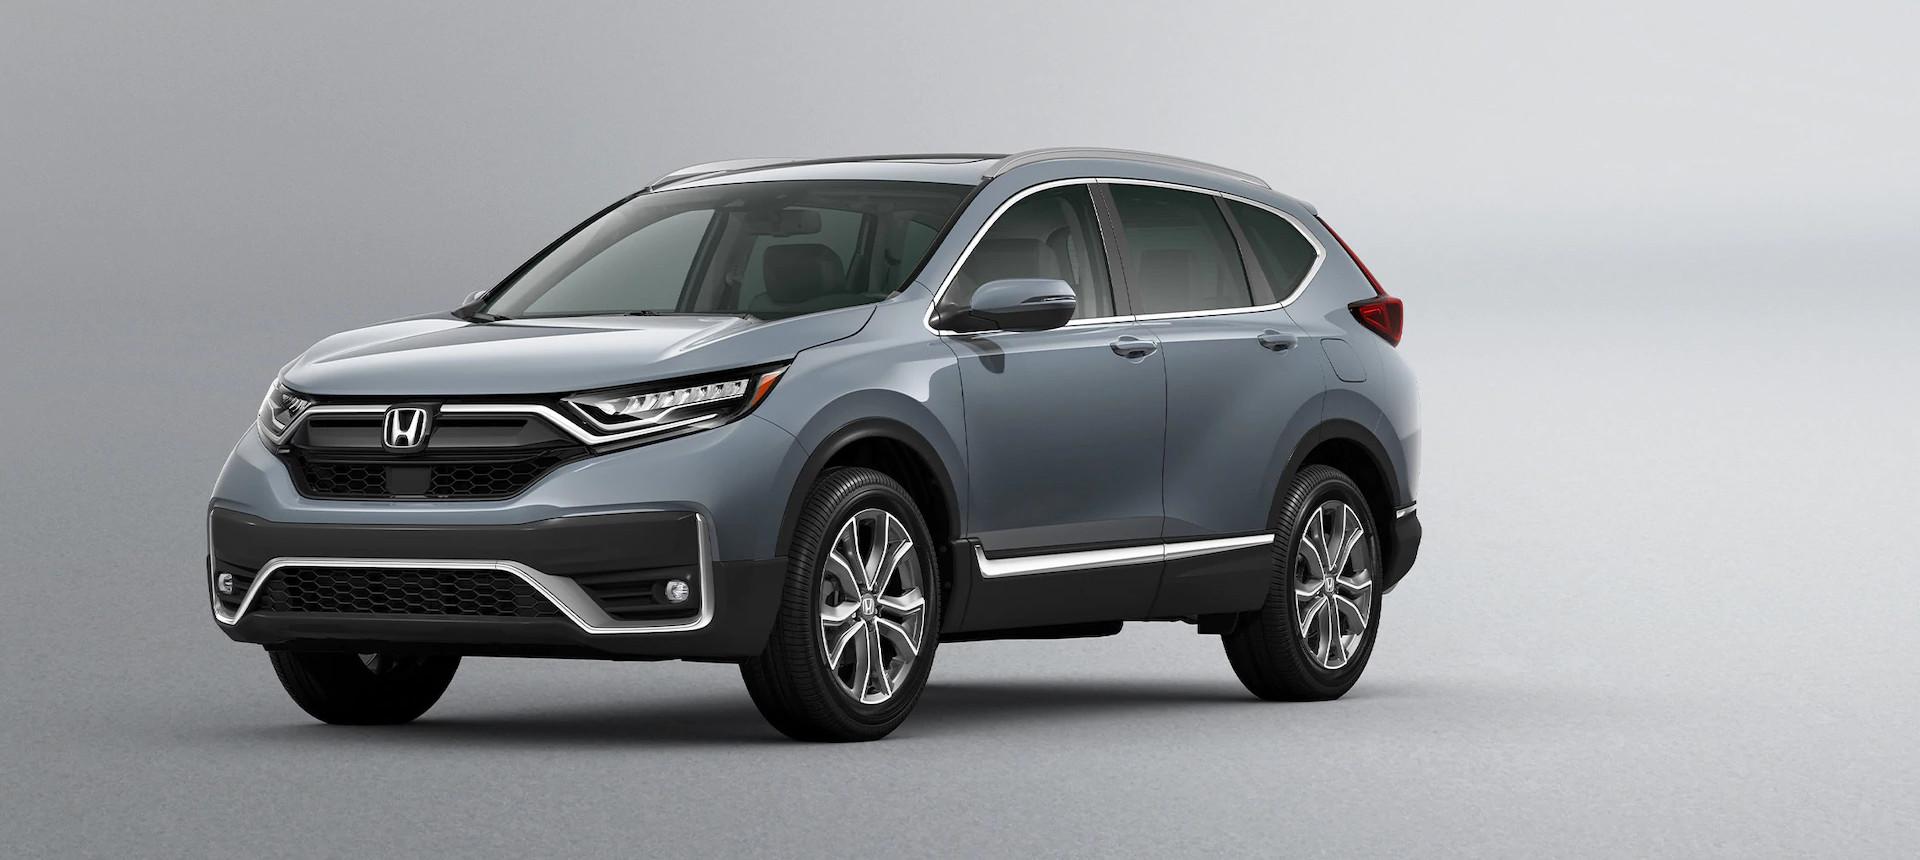 2020 Honda CR-V Leasing near Humble, TX